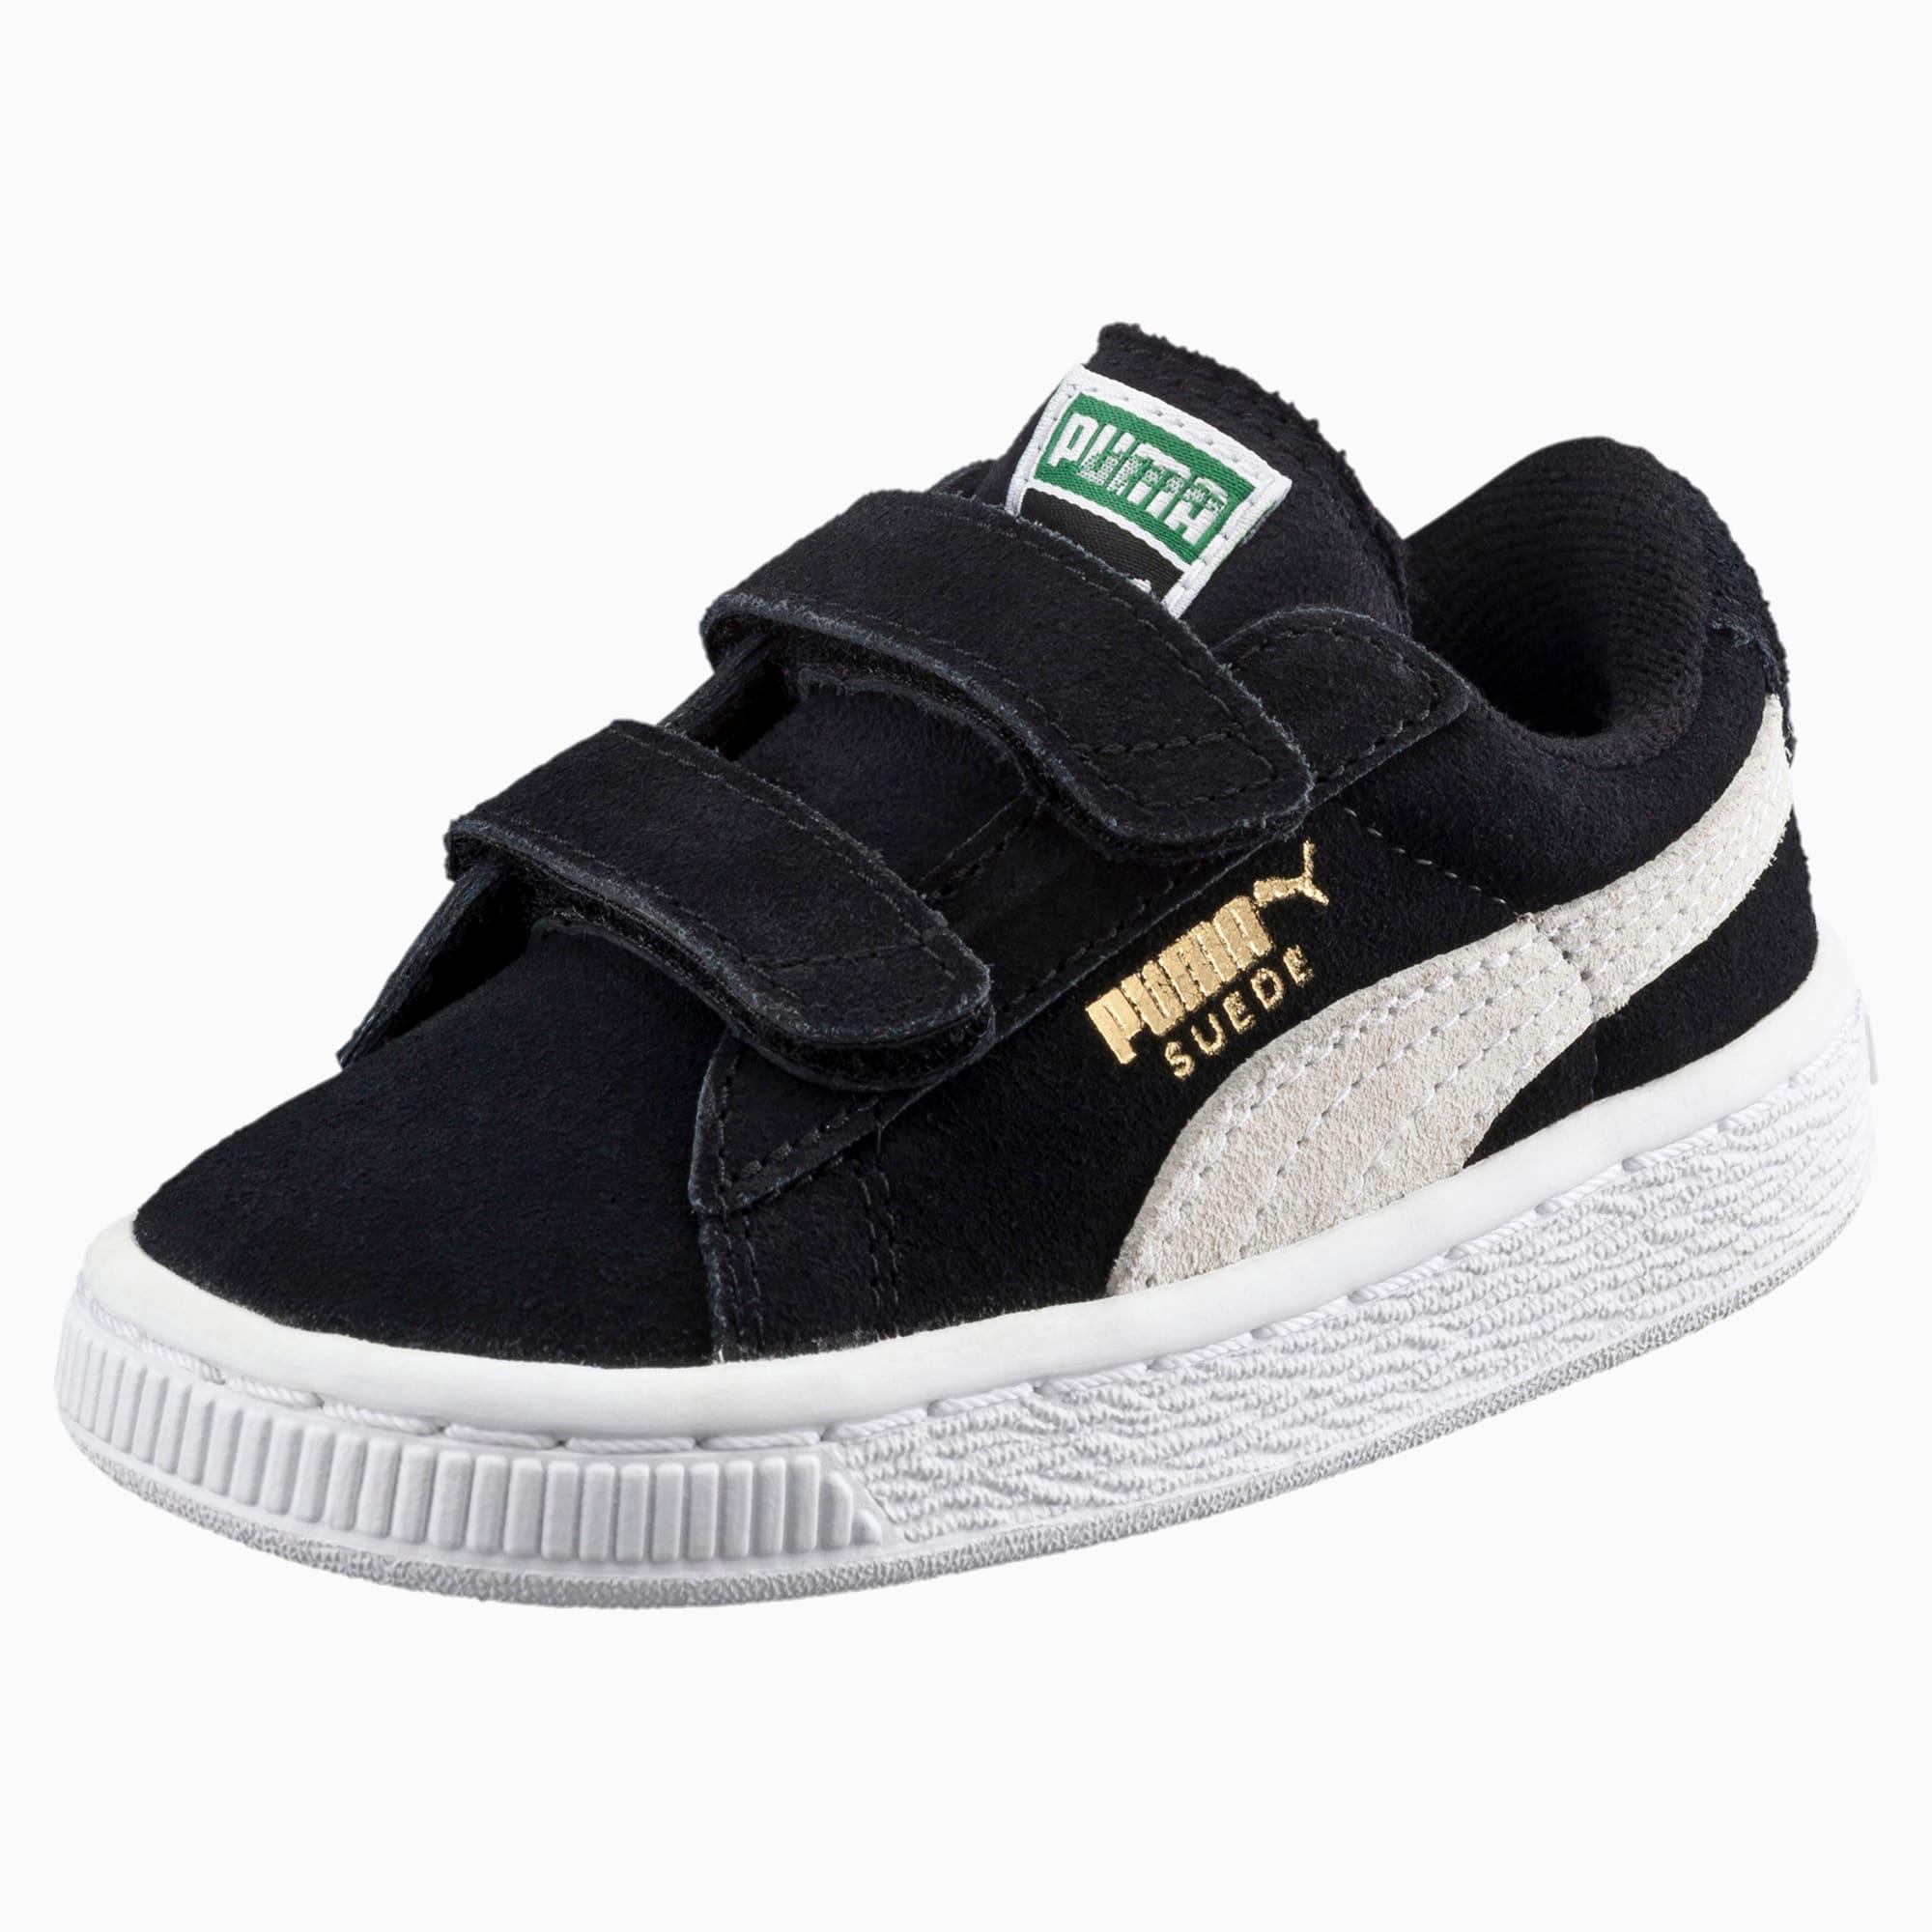 Suede 2 Straps Little Kids' Sneakers